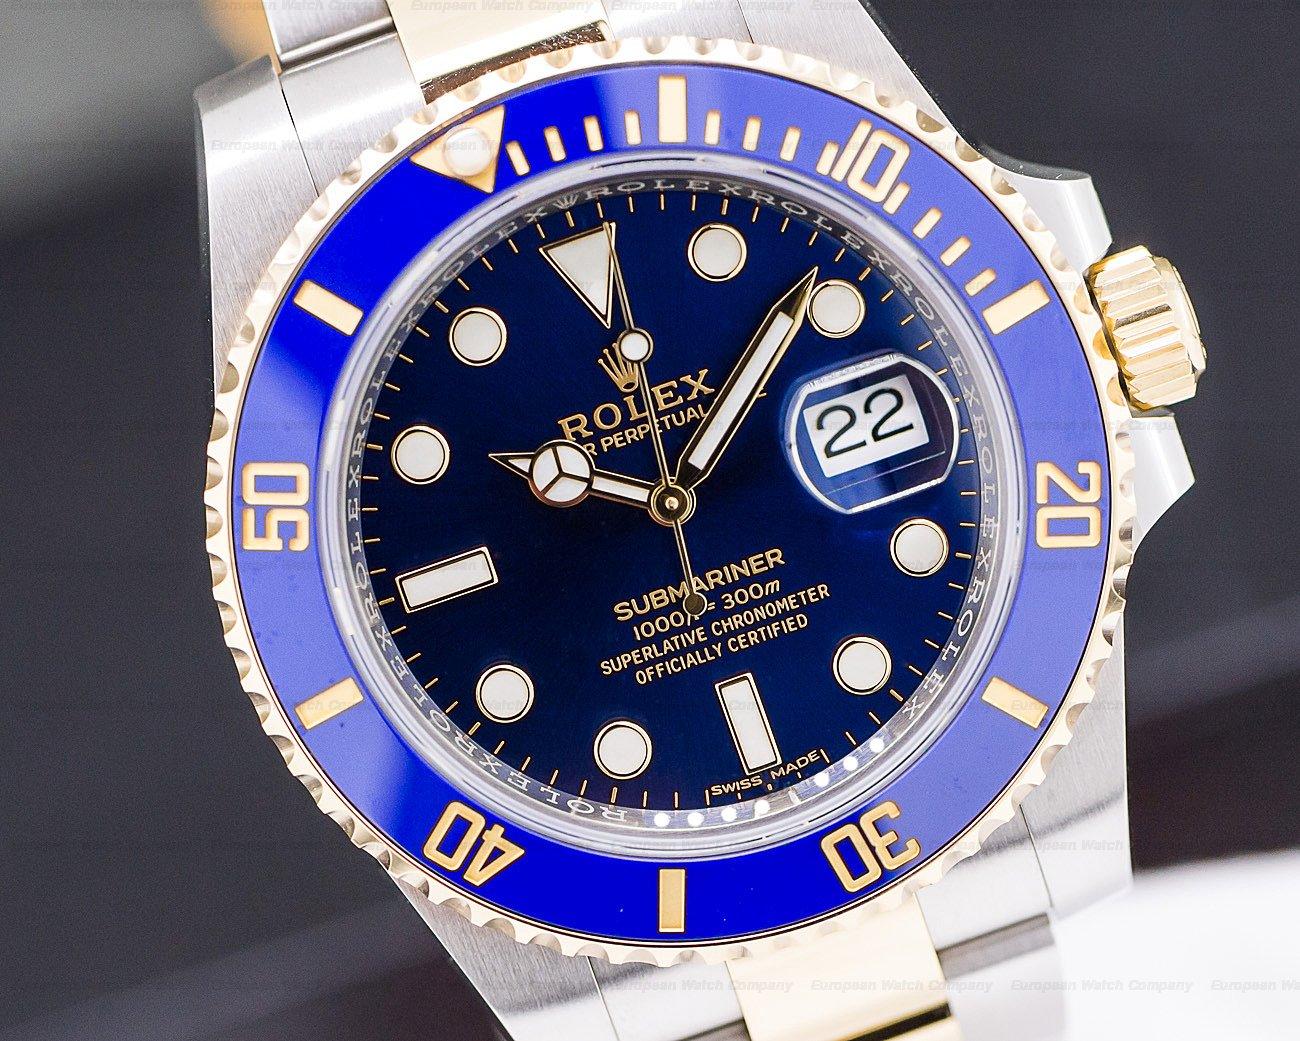 Rolex 116613LB Submariner Ceramic Blue Dial 18K / SS